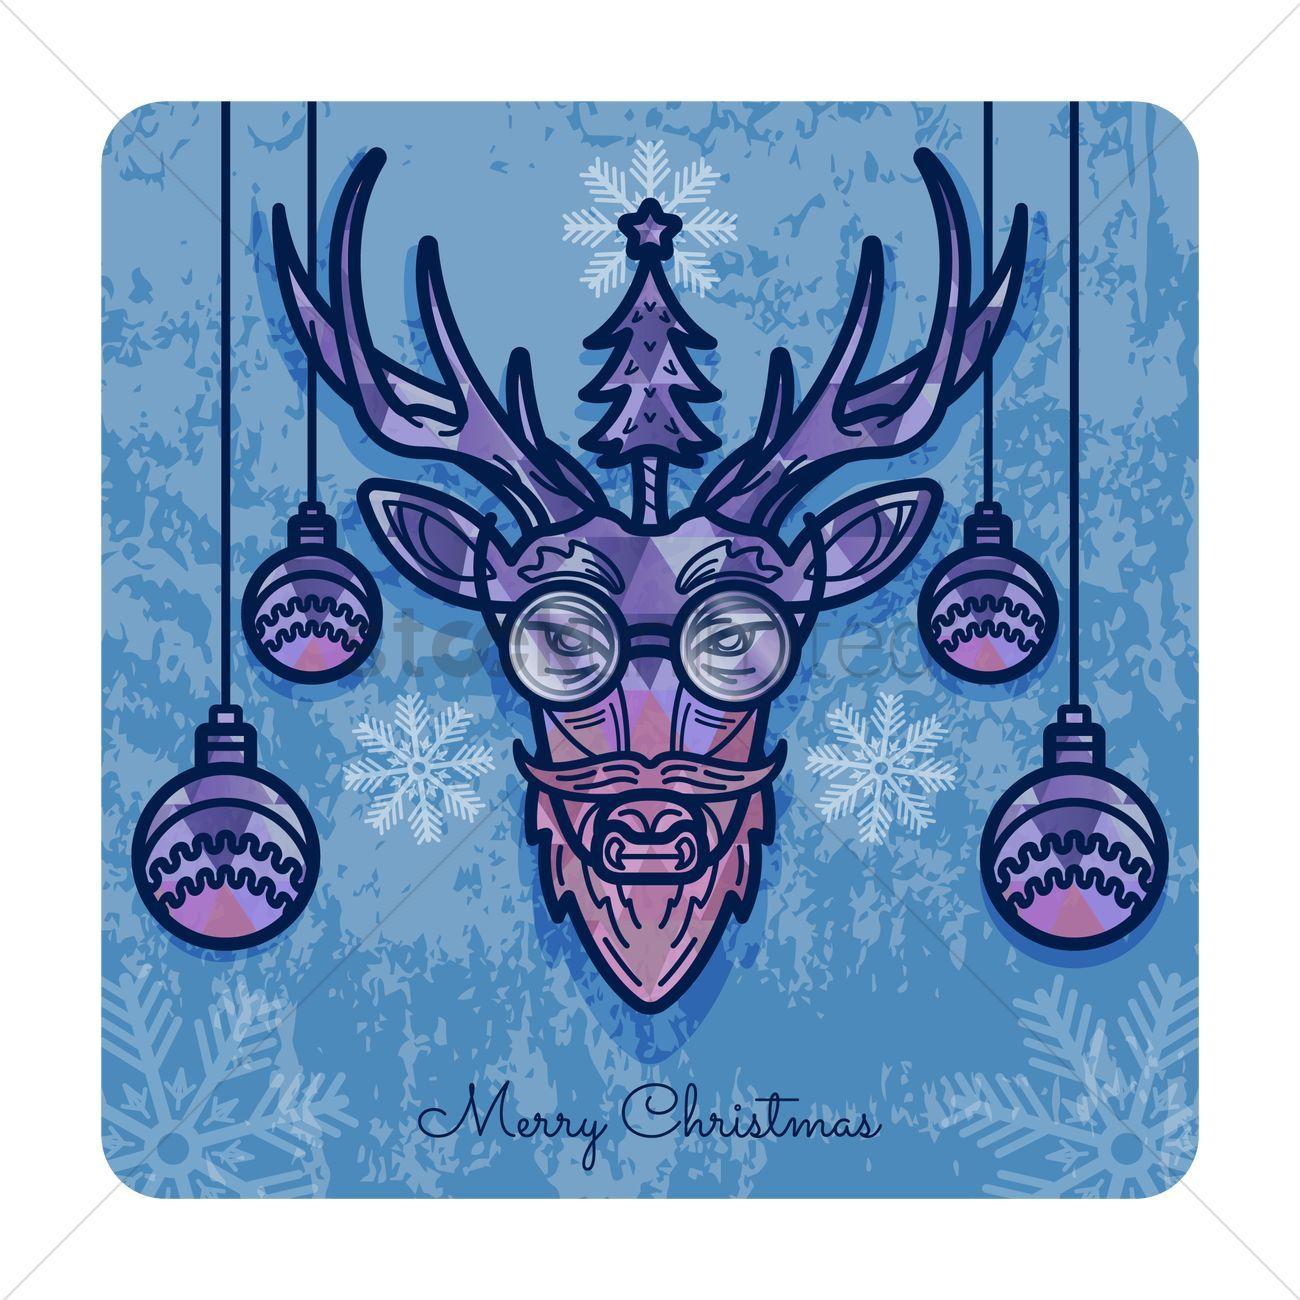 Merry christmas card design vectors, stock clipart ,